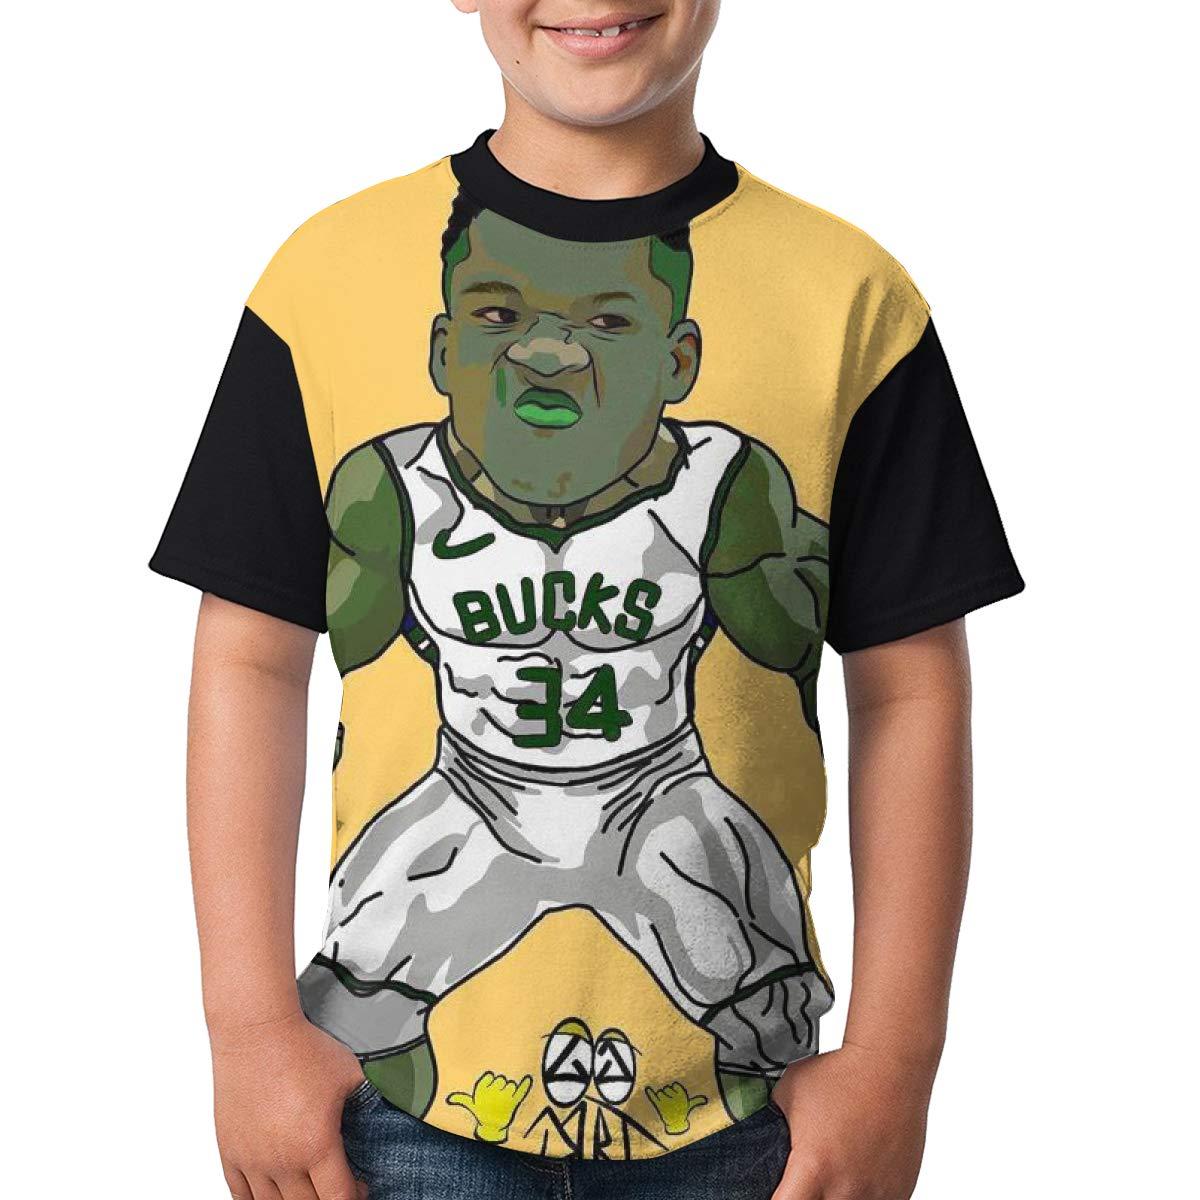 goAgoo Antetokoumpo Bucks Short Sleeve Tee for Boys Kids Youth Logo on Shirt